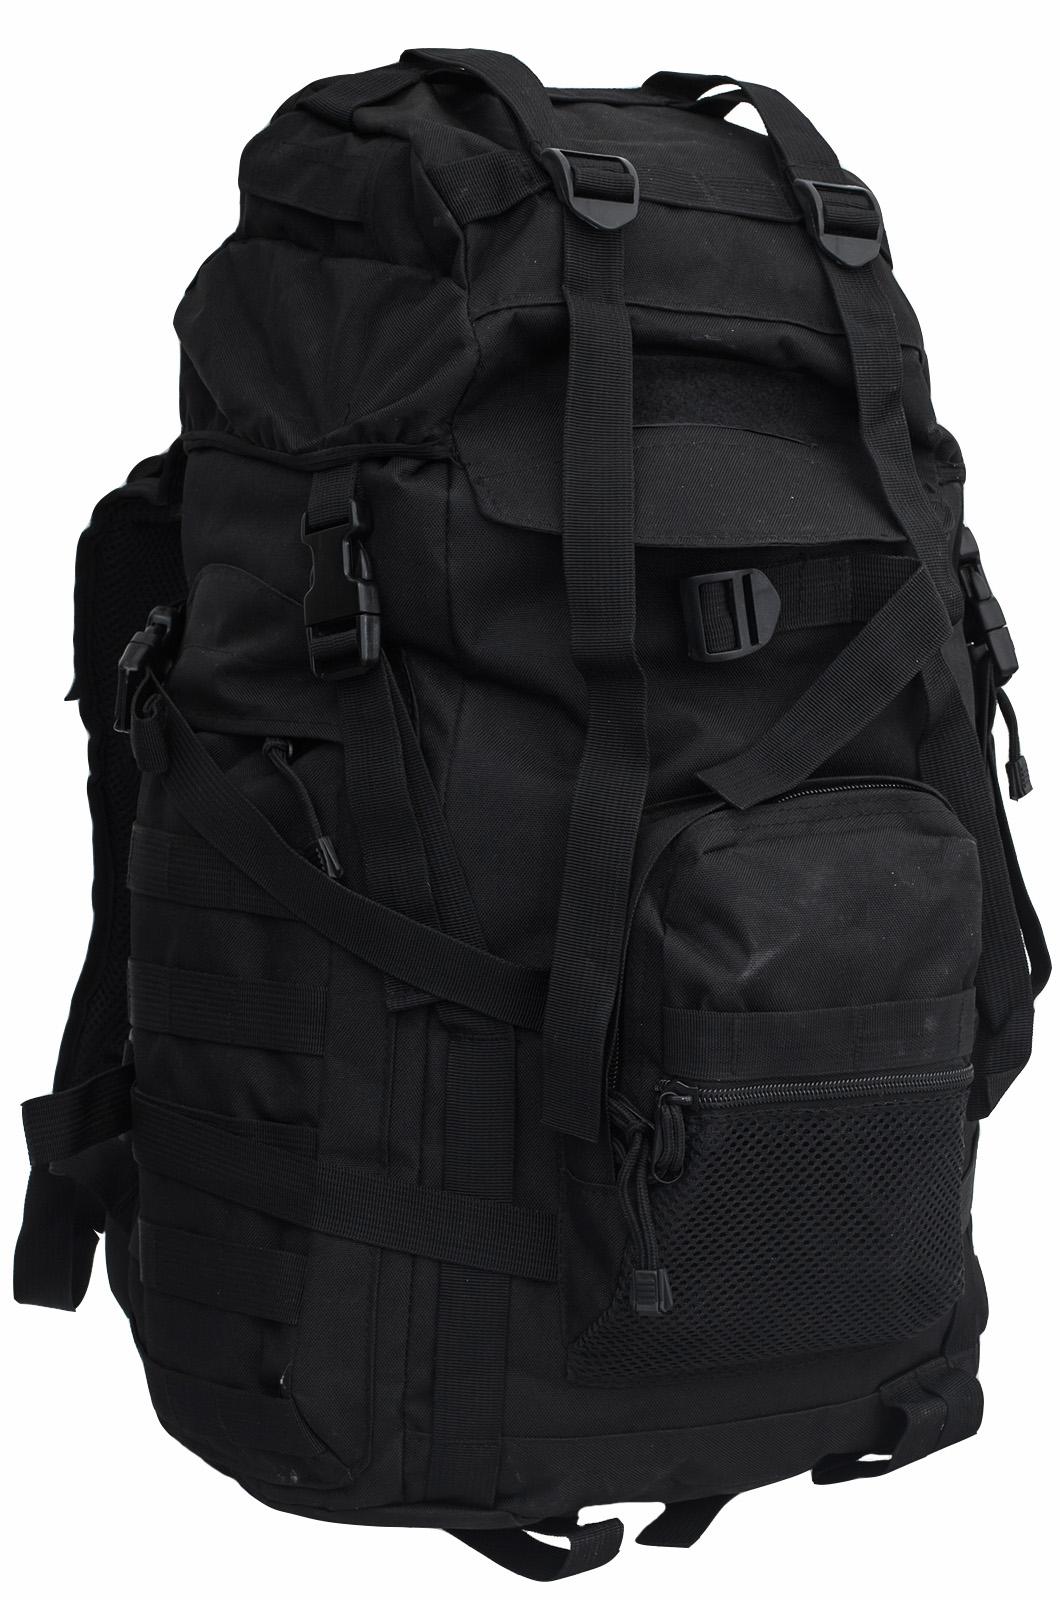 Черный армейский рюкзак (объем - 30-50 литров) 967444e5665